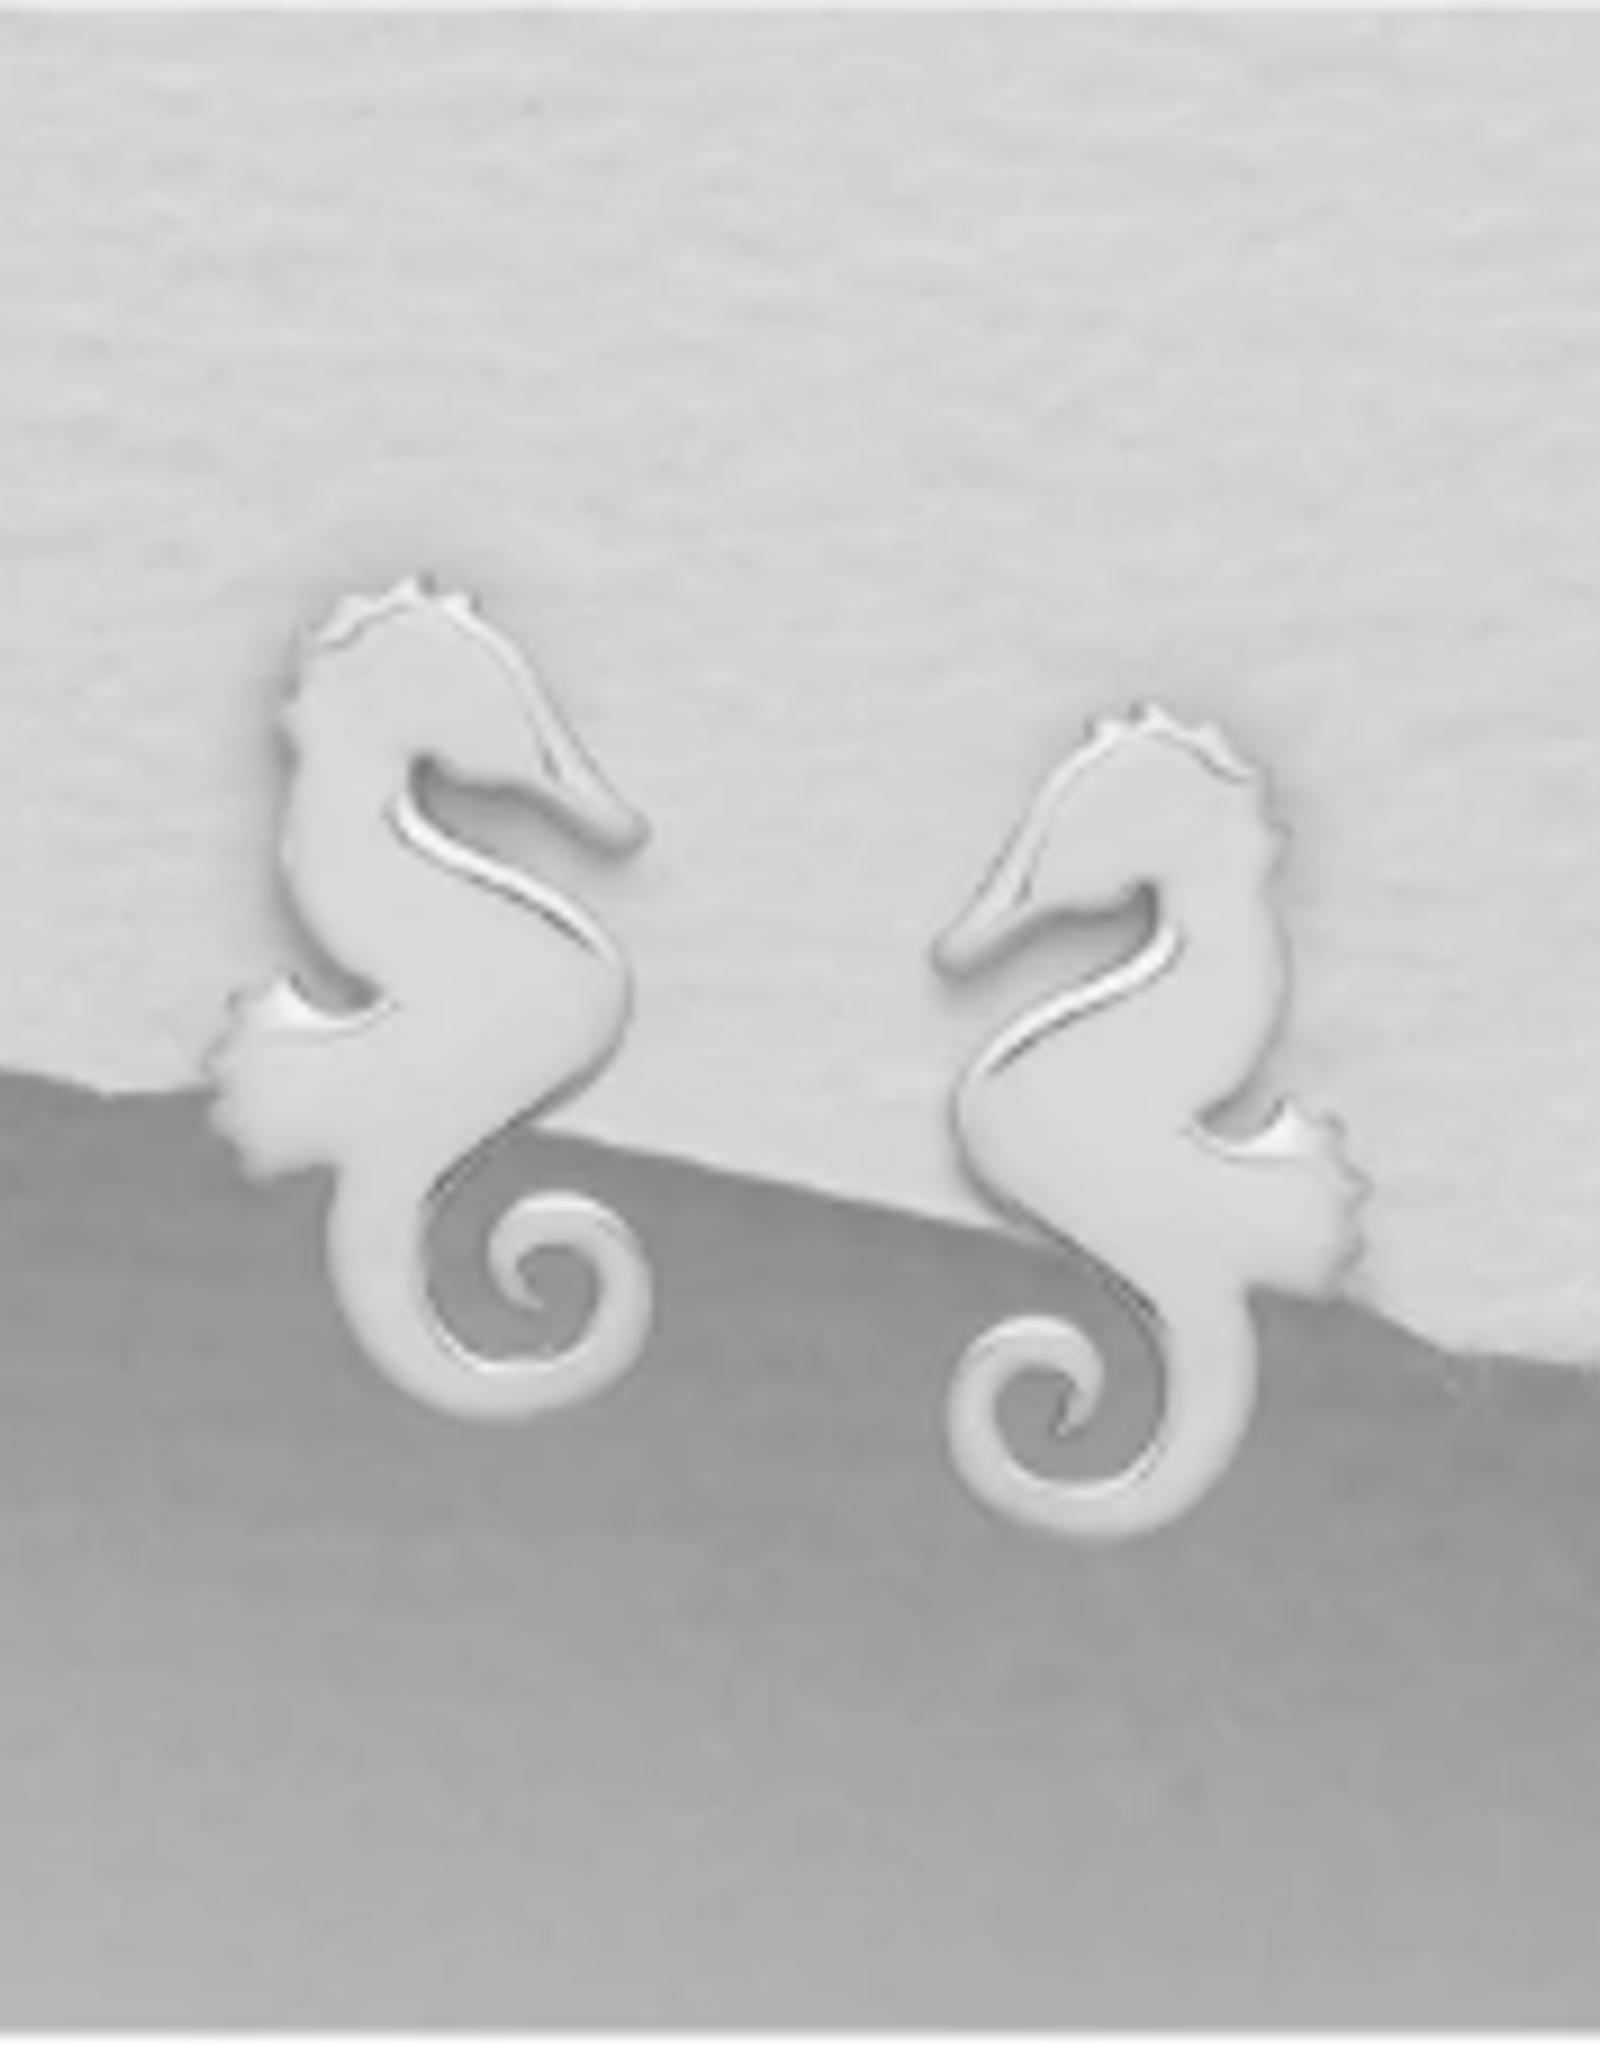 Lily & Momo Seahorse Earrings, silver